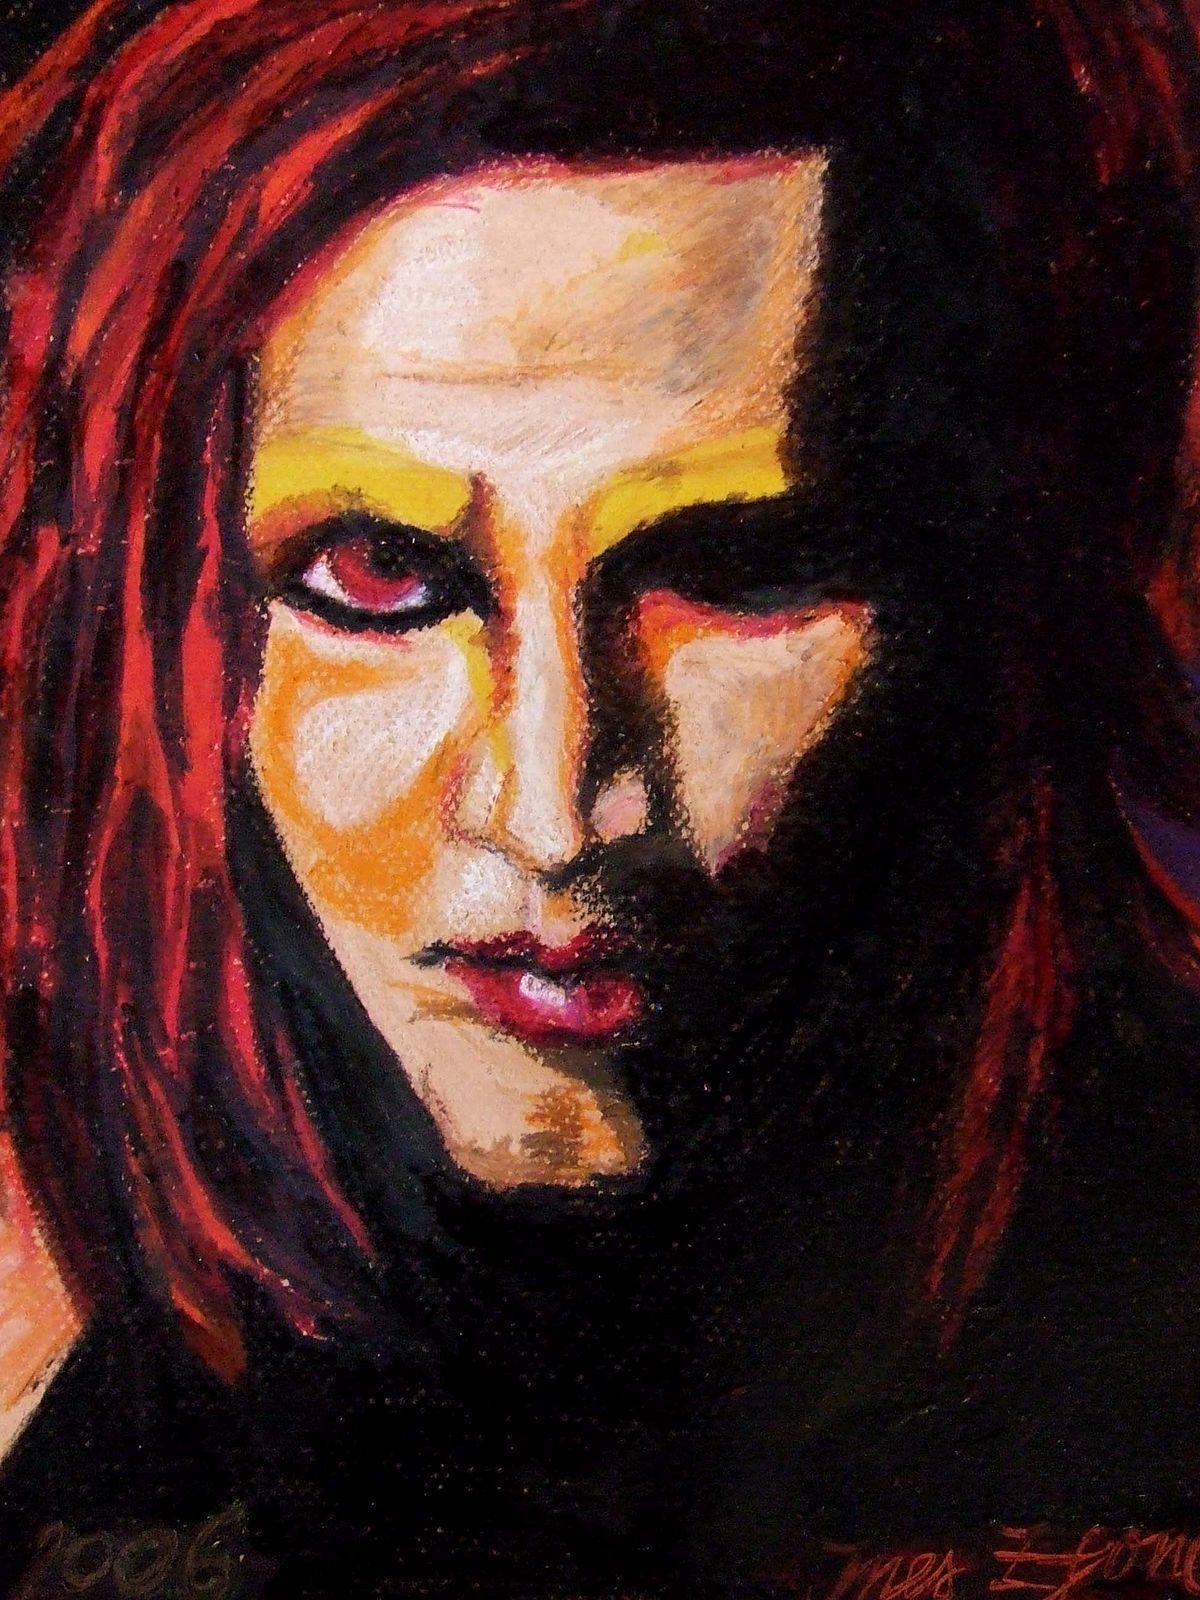 Marilyn Manson Wikiquote